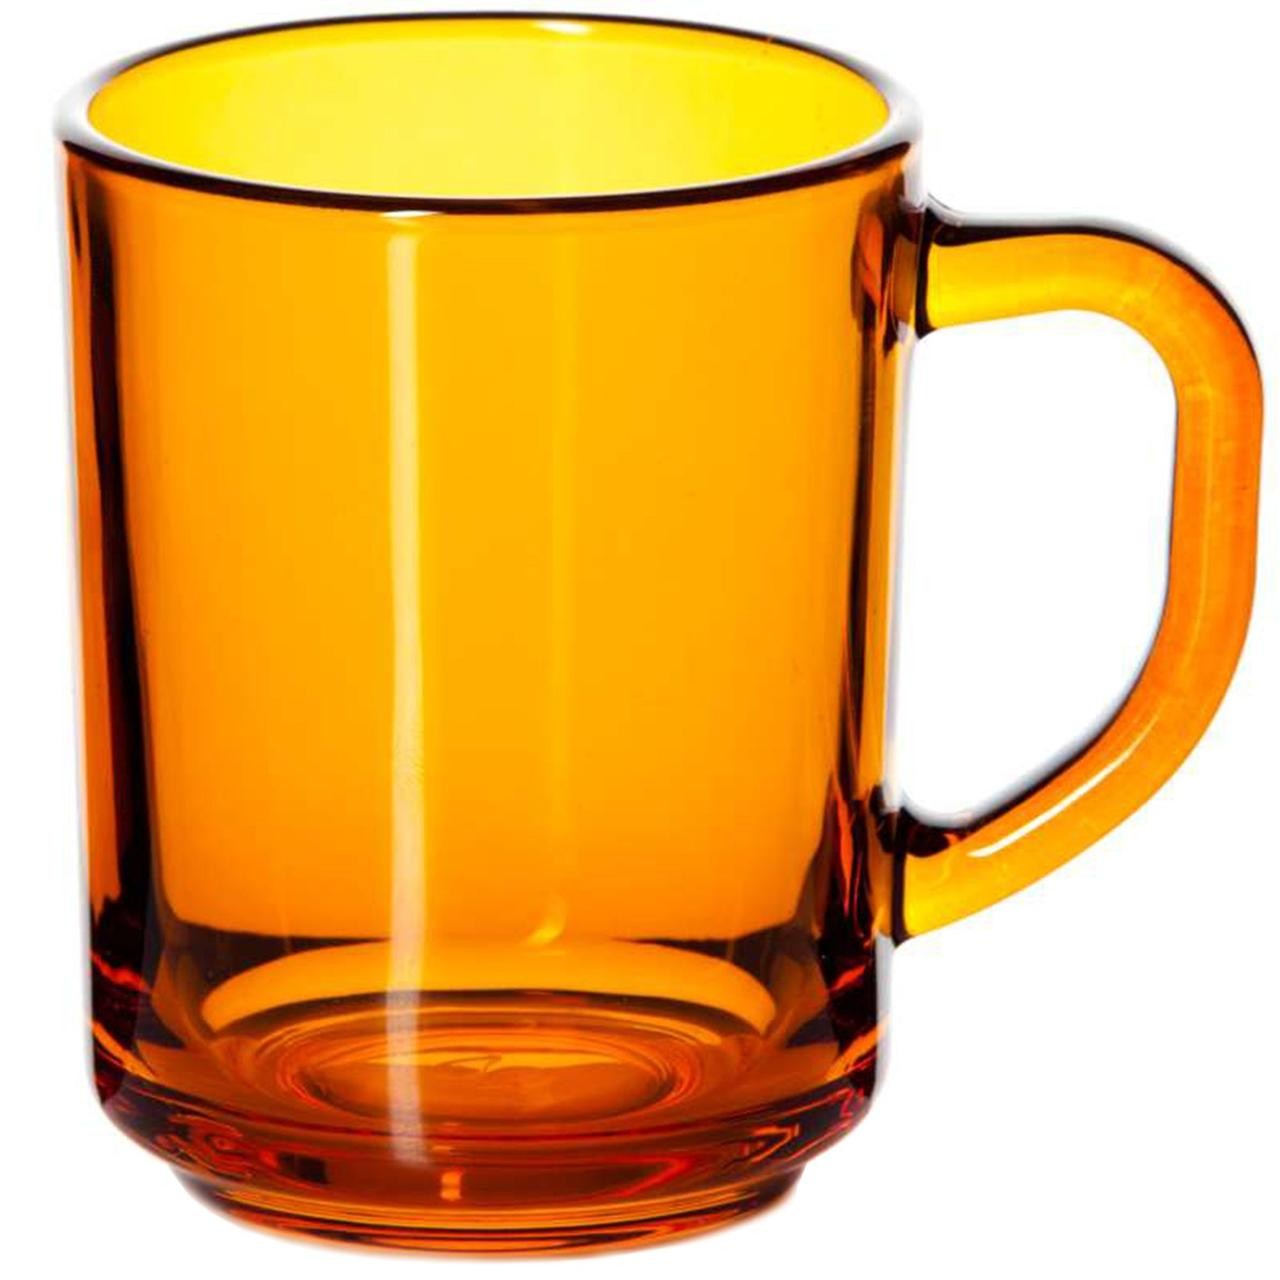 Кружка Enjoy, оранжевая (артикул 10248.20)